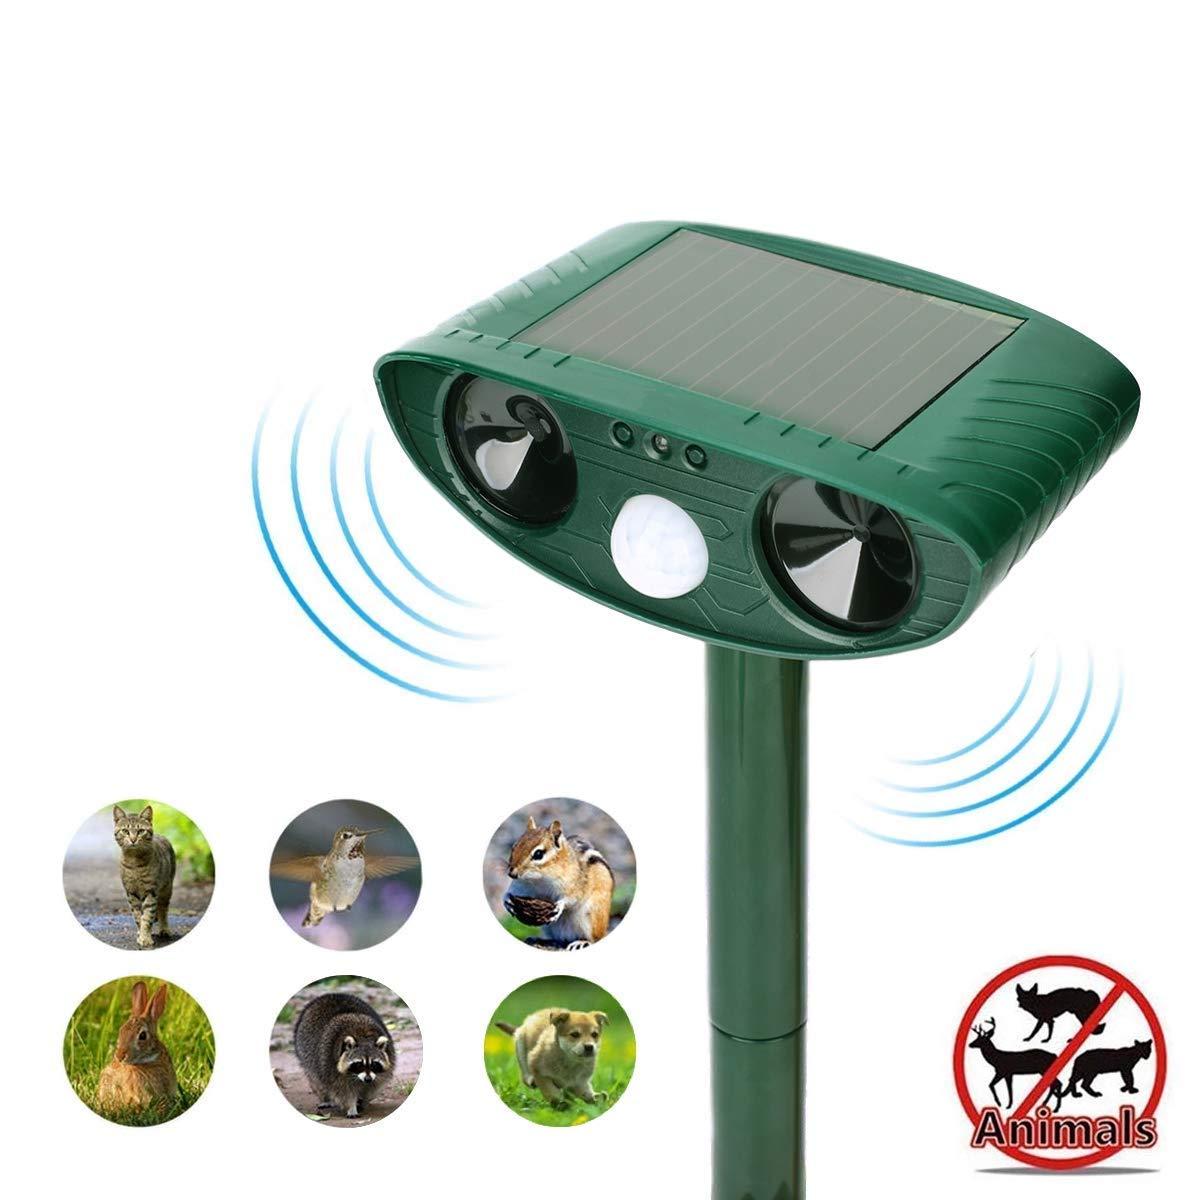 Ultrasonic Animal Repeller, Solar repellent with Motion Sensor Ultrasonic and Red Flashing lights Outdoor Waterproof Farm Garden Yard repellent, Cats, Dogs, Foxes, Birds, Skunks, Rodent, Deer, Raccoon